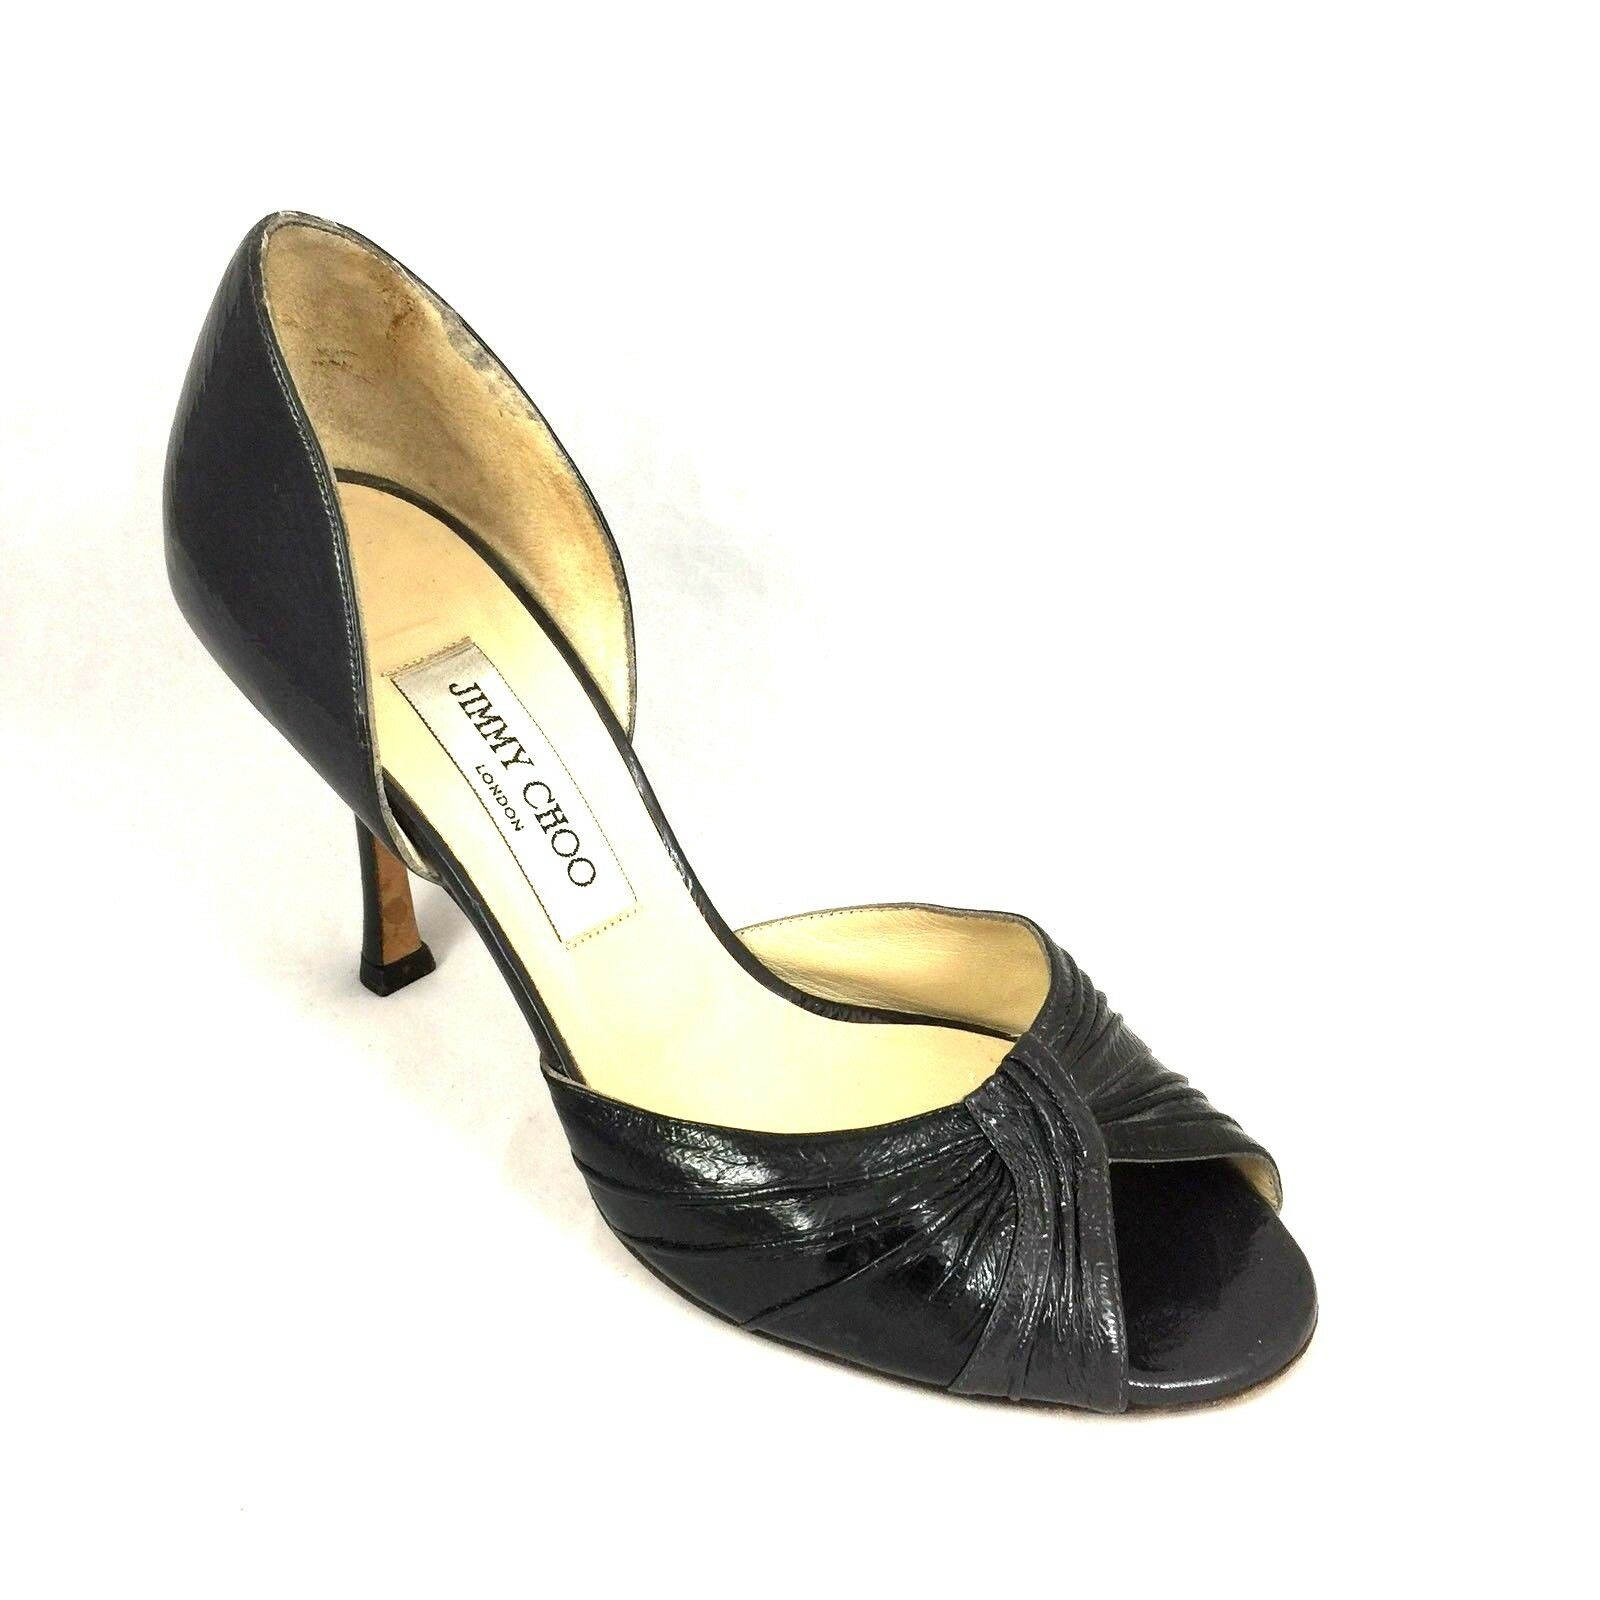 Jimmy Choo Dorsay Pump Black Two Tone Ruched Sandal Patent Leather Peep Toe 38 8